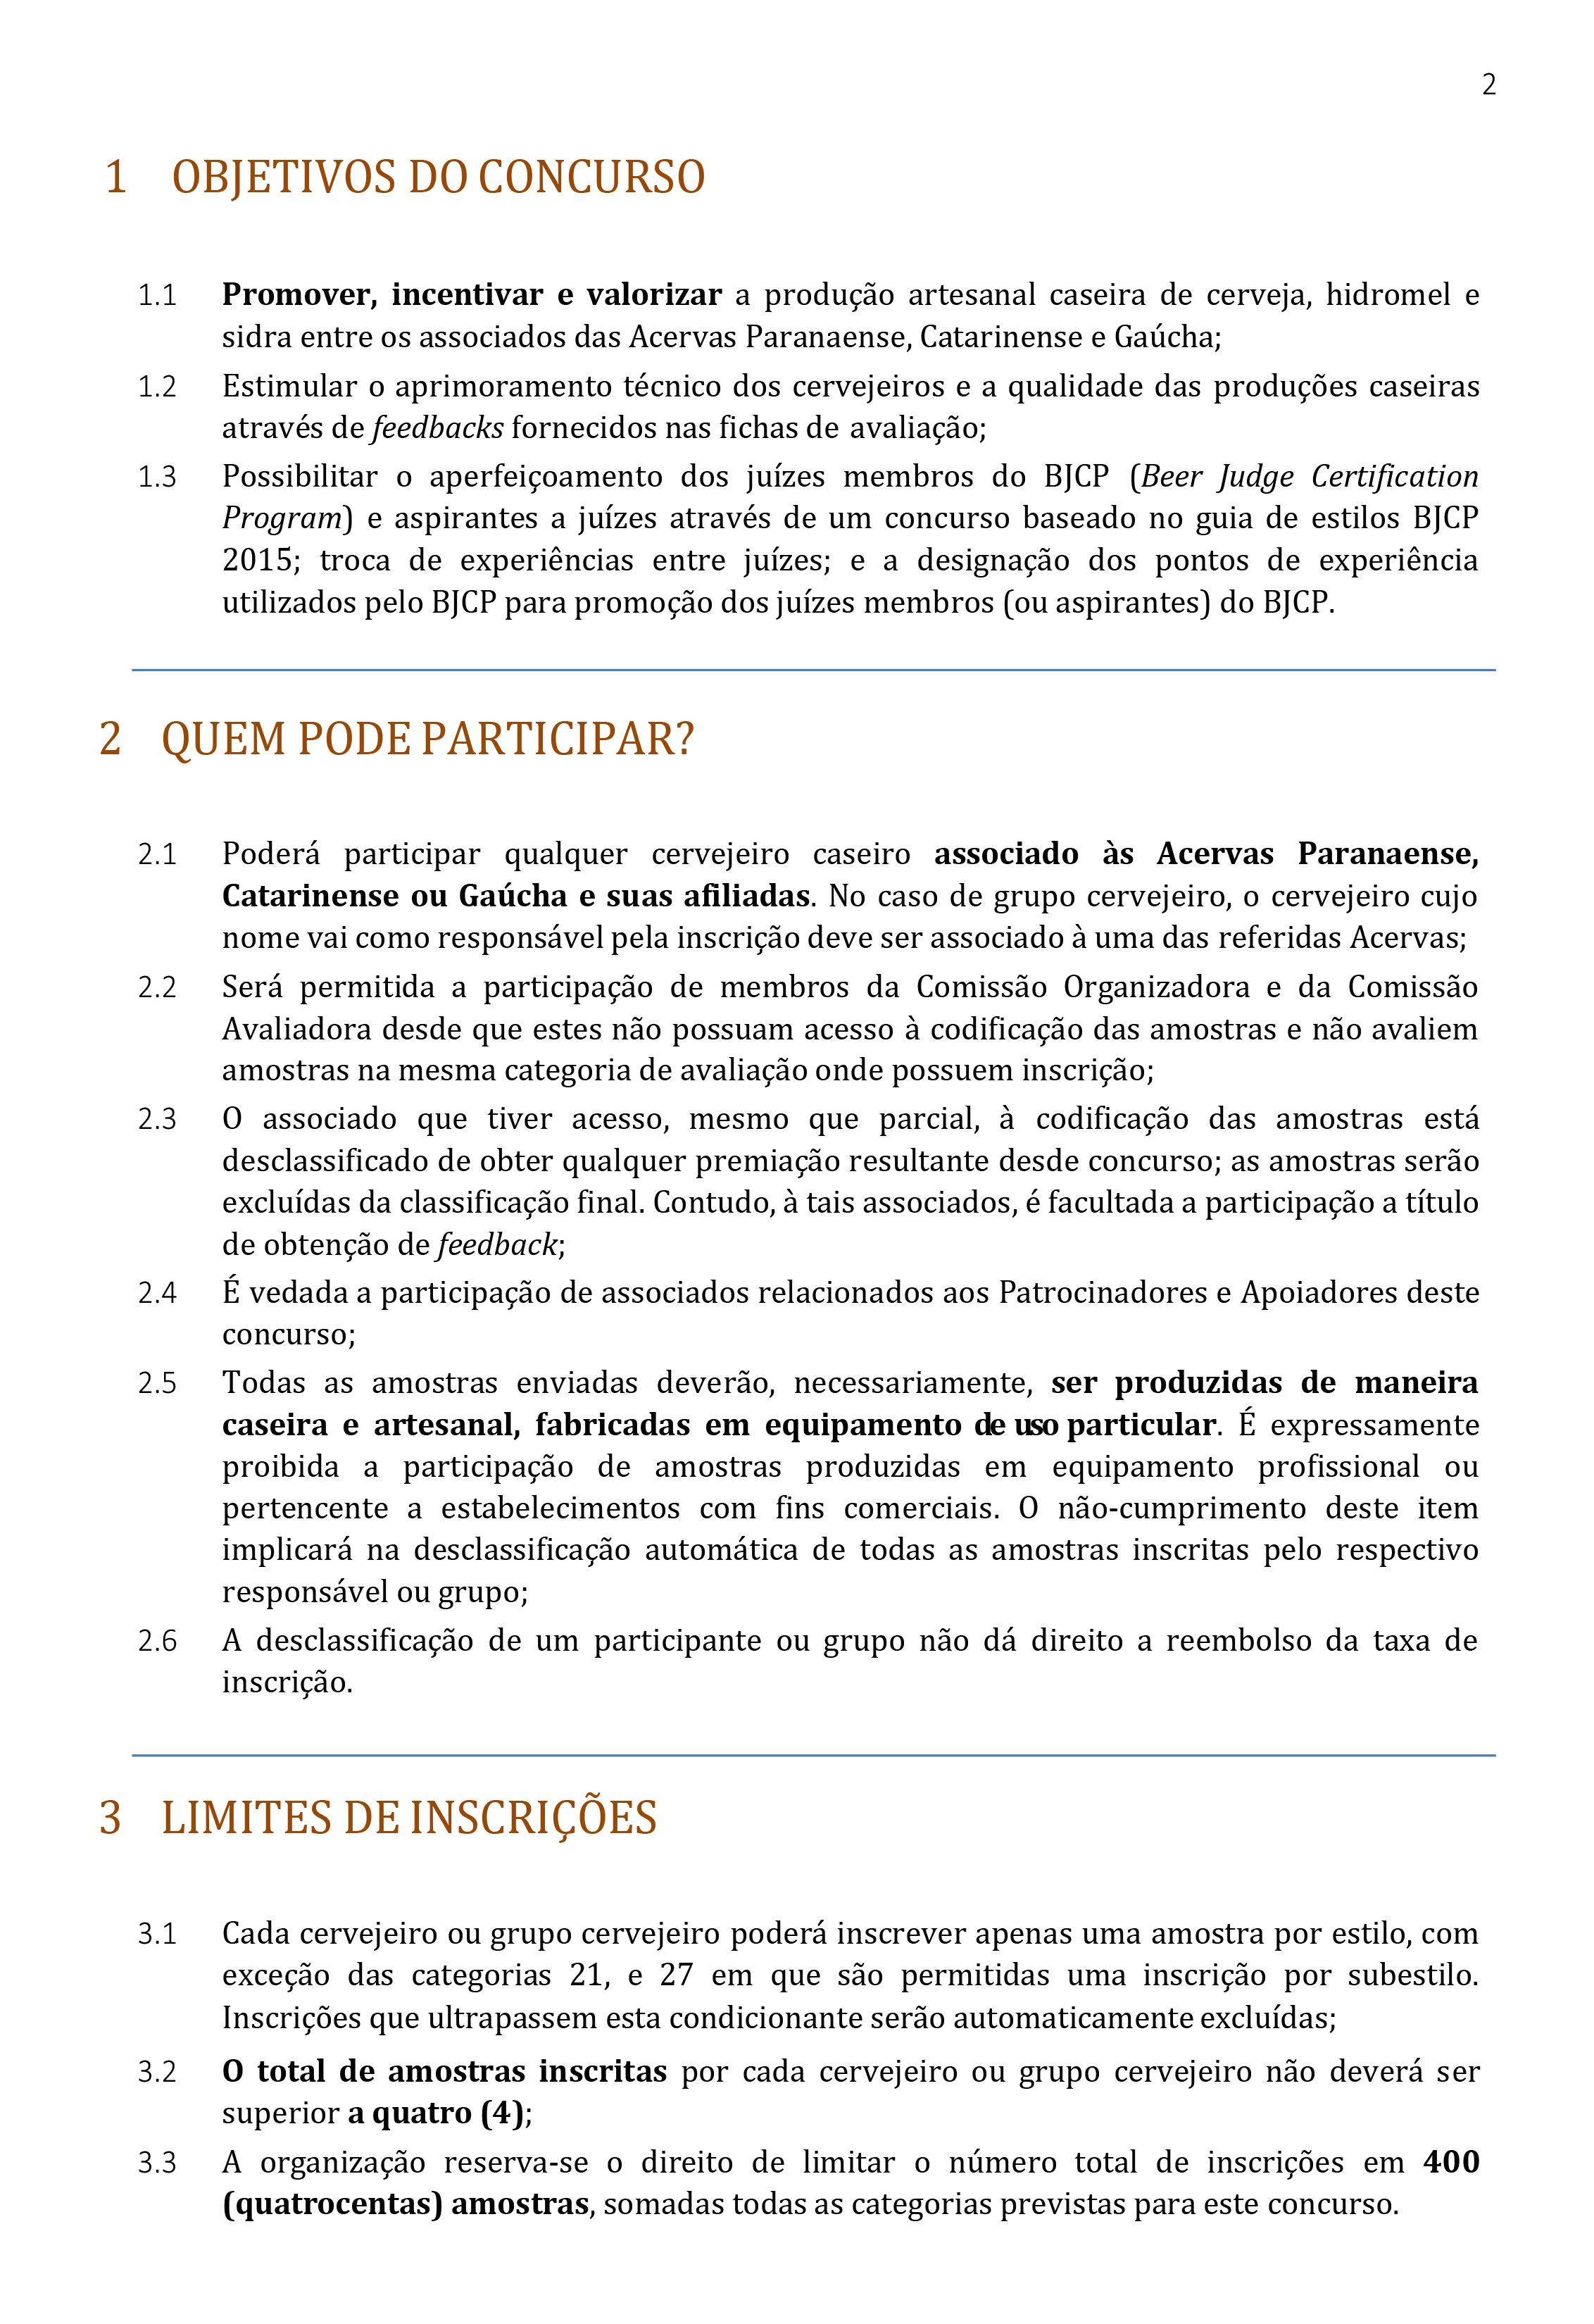 IV Concurso Sulbrasileiro 2017-Regulamento-2.jpg